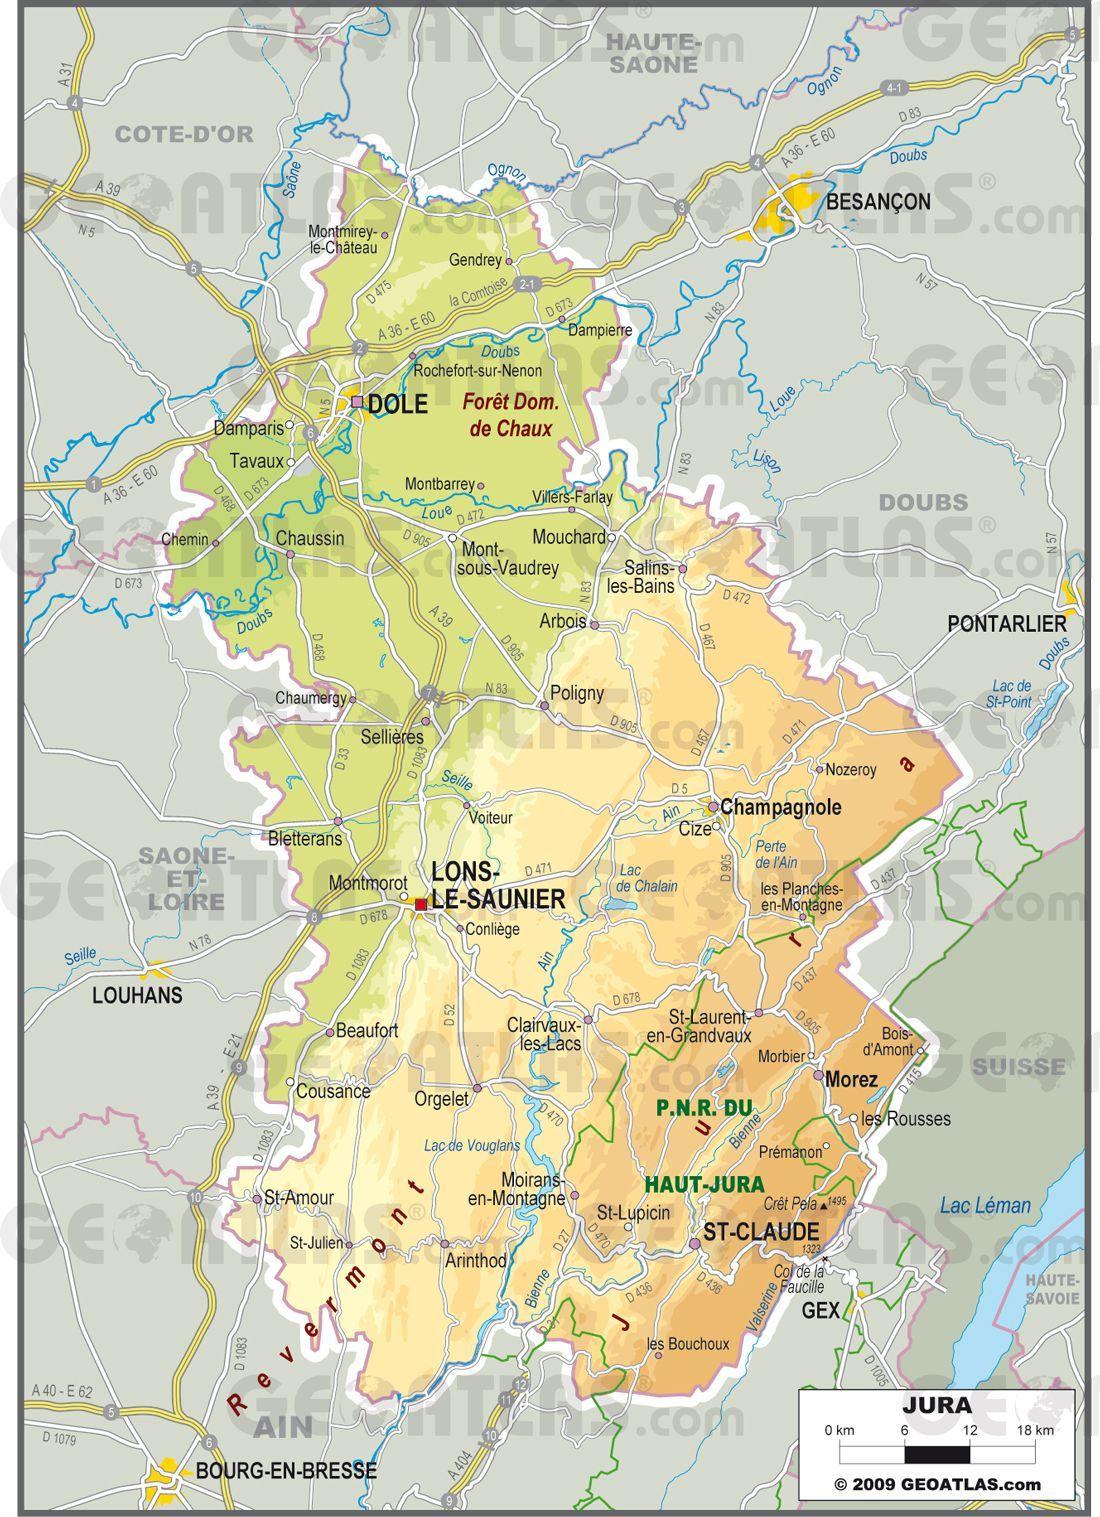 Carte Du Jura Villes Relief En 2021 Jura France Carte Jura Carte Touristique